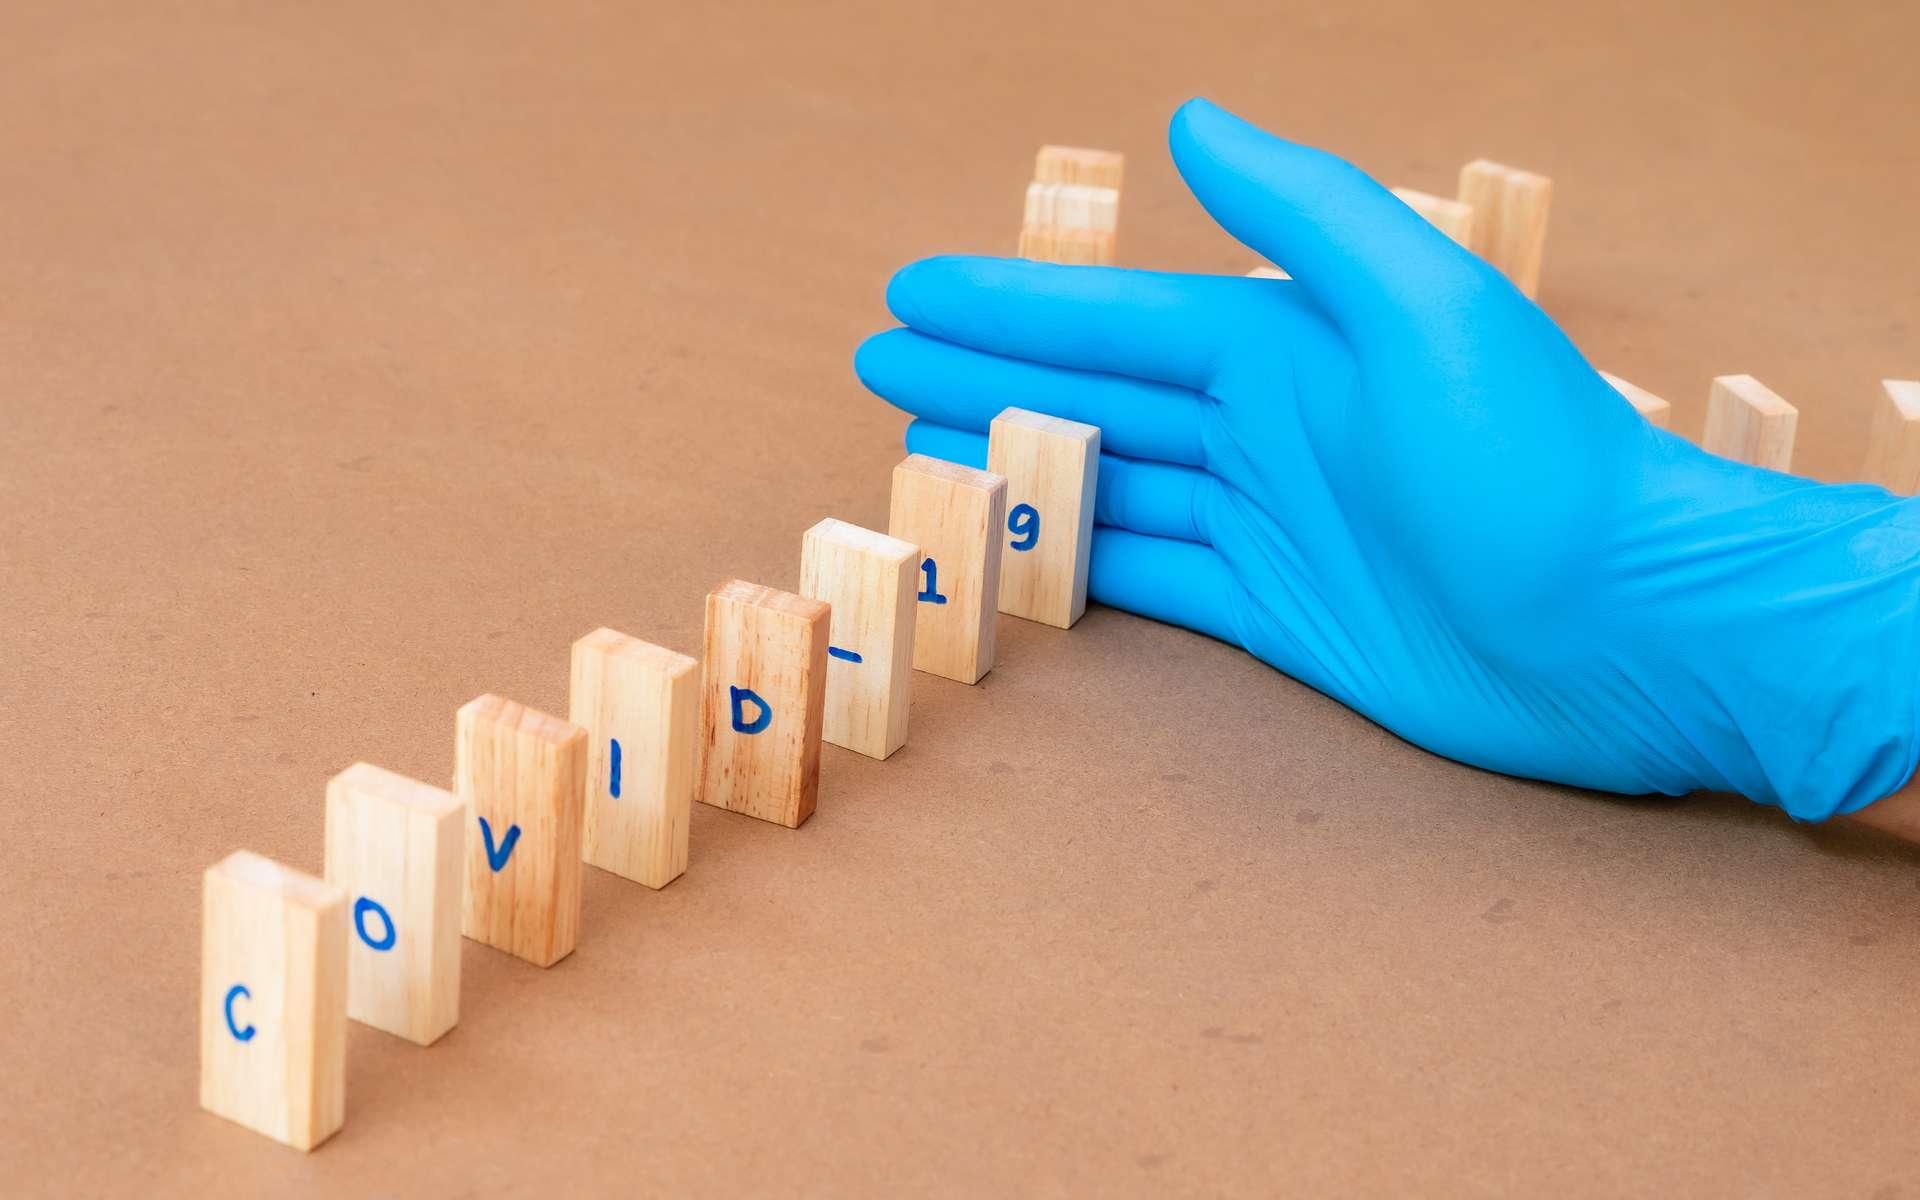 La chloroquine est-elle efficace contre la Covid-19 ? © Khamkula, Adobe Stock